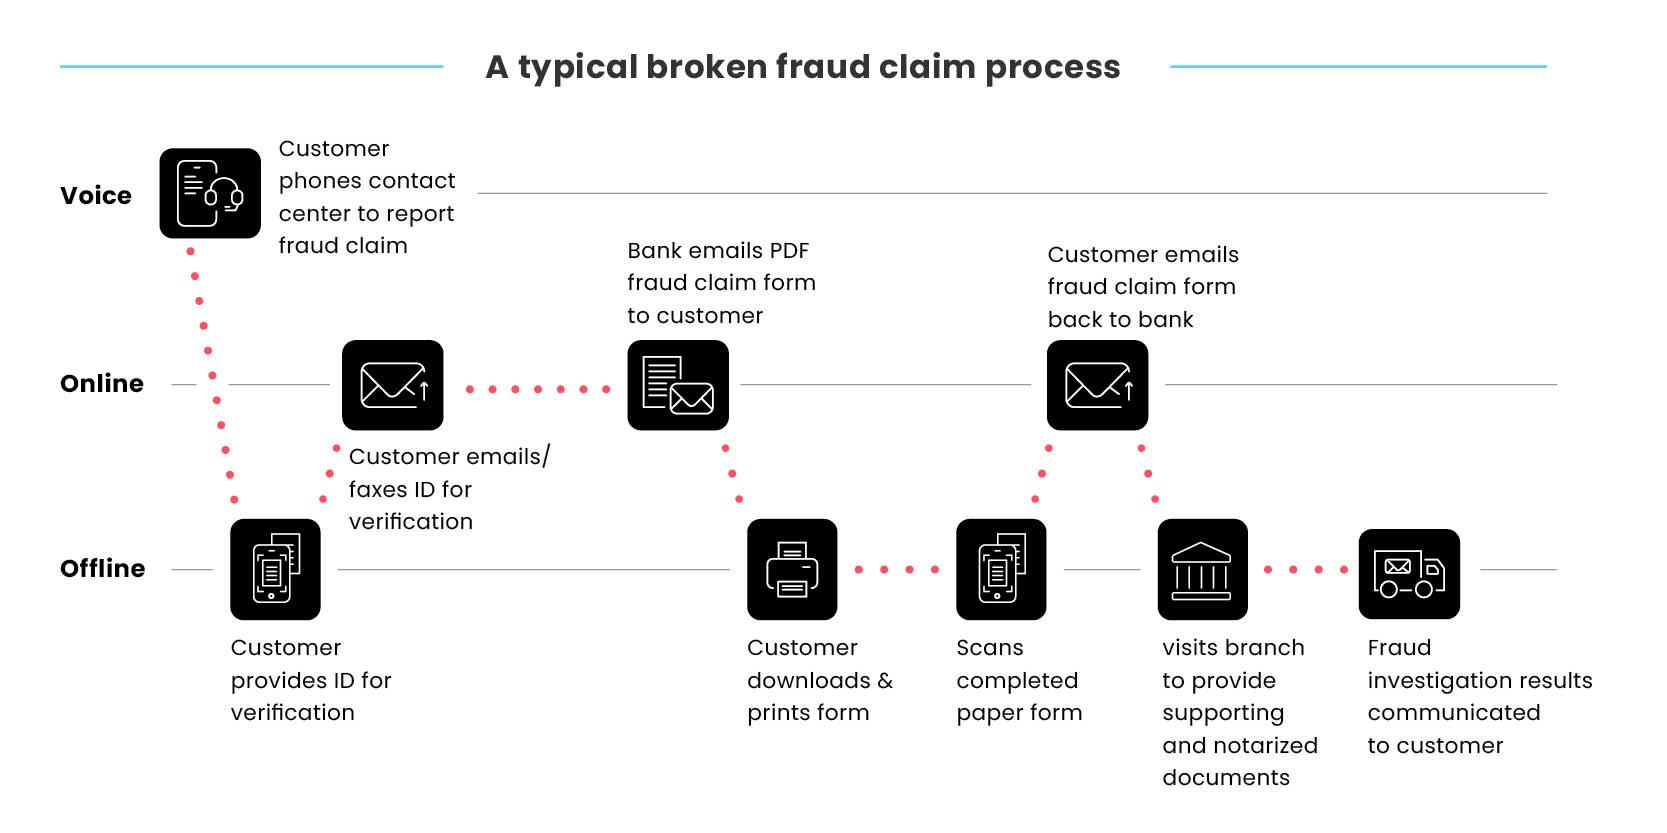 broken-journies-blog-images-bankning-fraud-claims